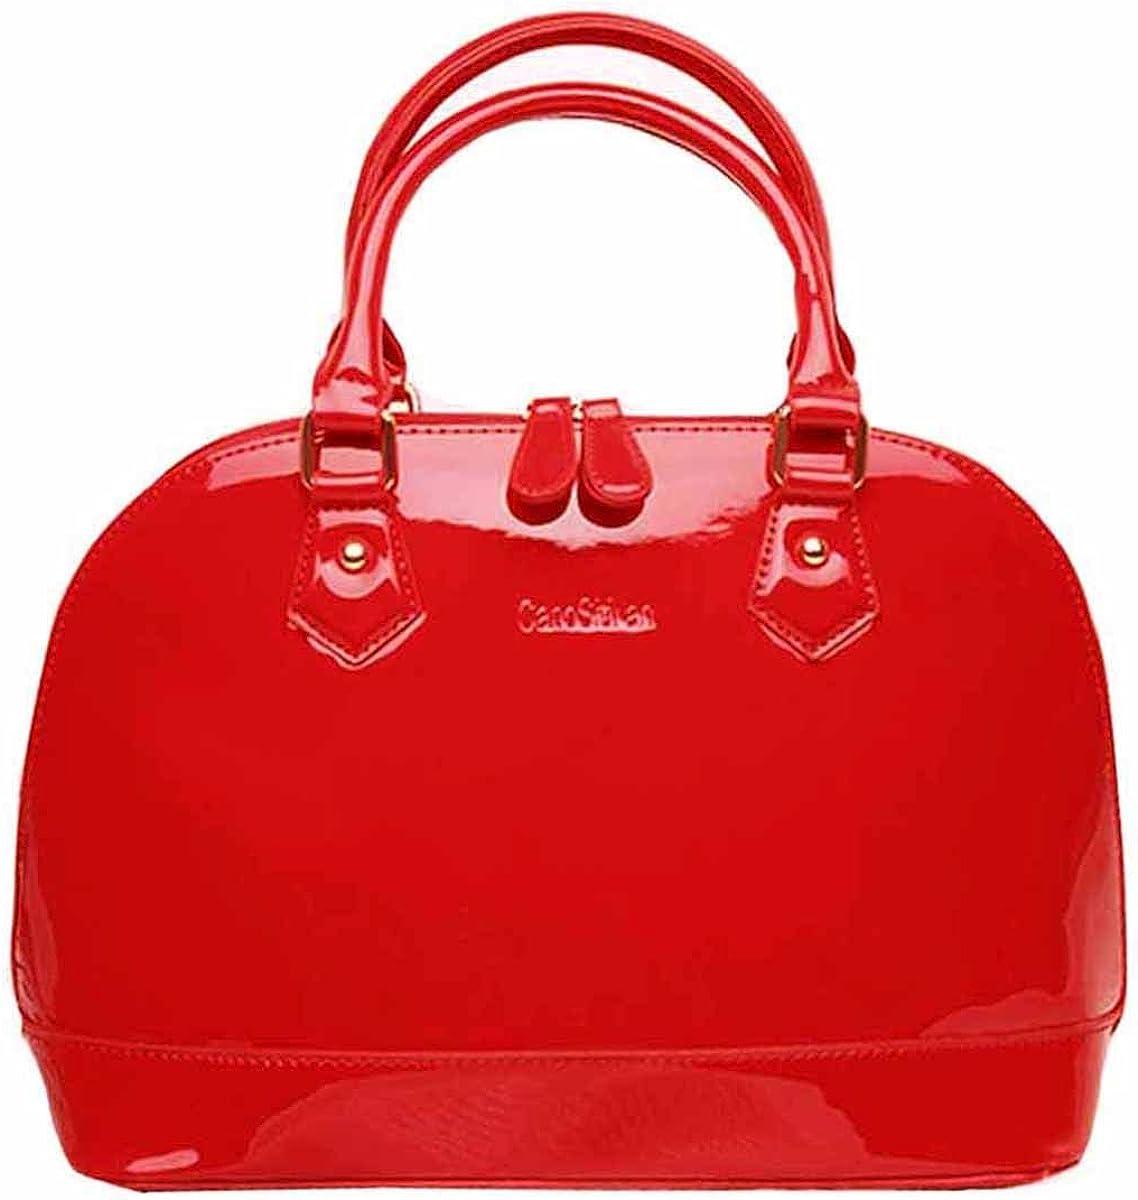 Goodbag Boutique Lady Patent Leather Handbag Satchel Tote Handbag Shell Bag Jelly Shoulder Bag Top Handle Bags